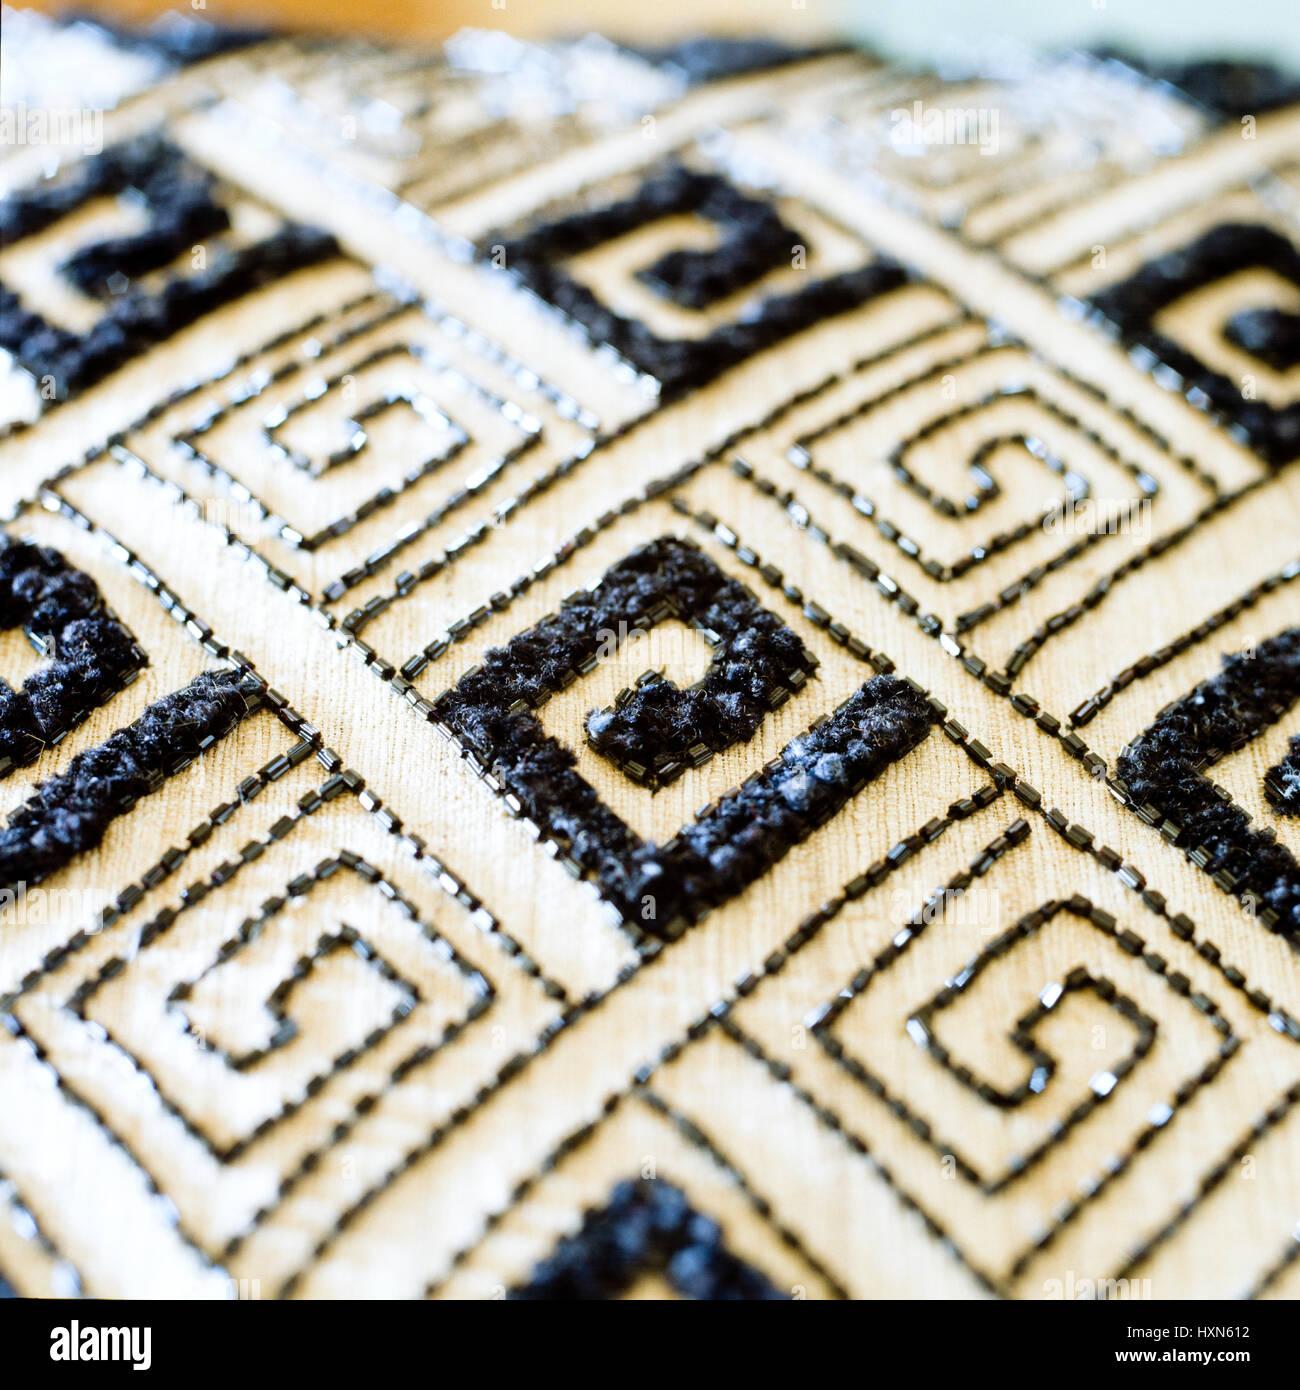 Black and white patterned cushion. - Stock Image